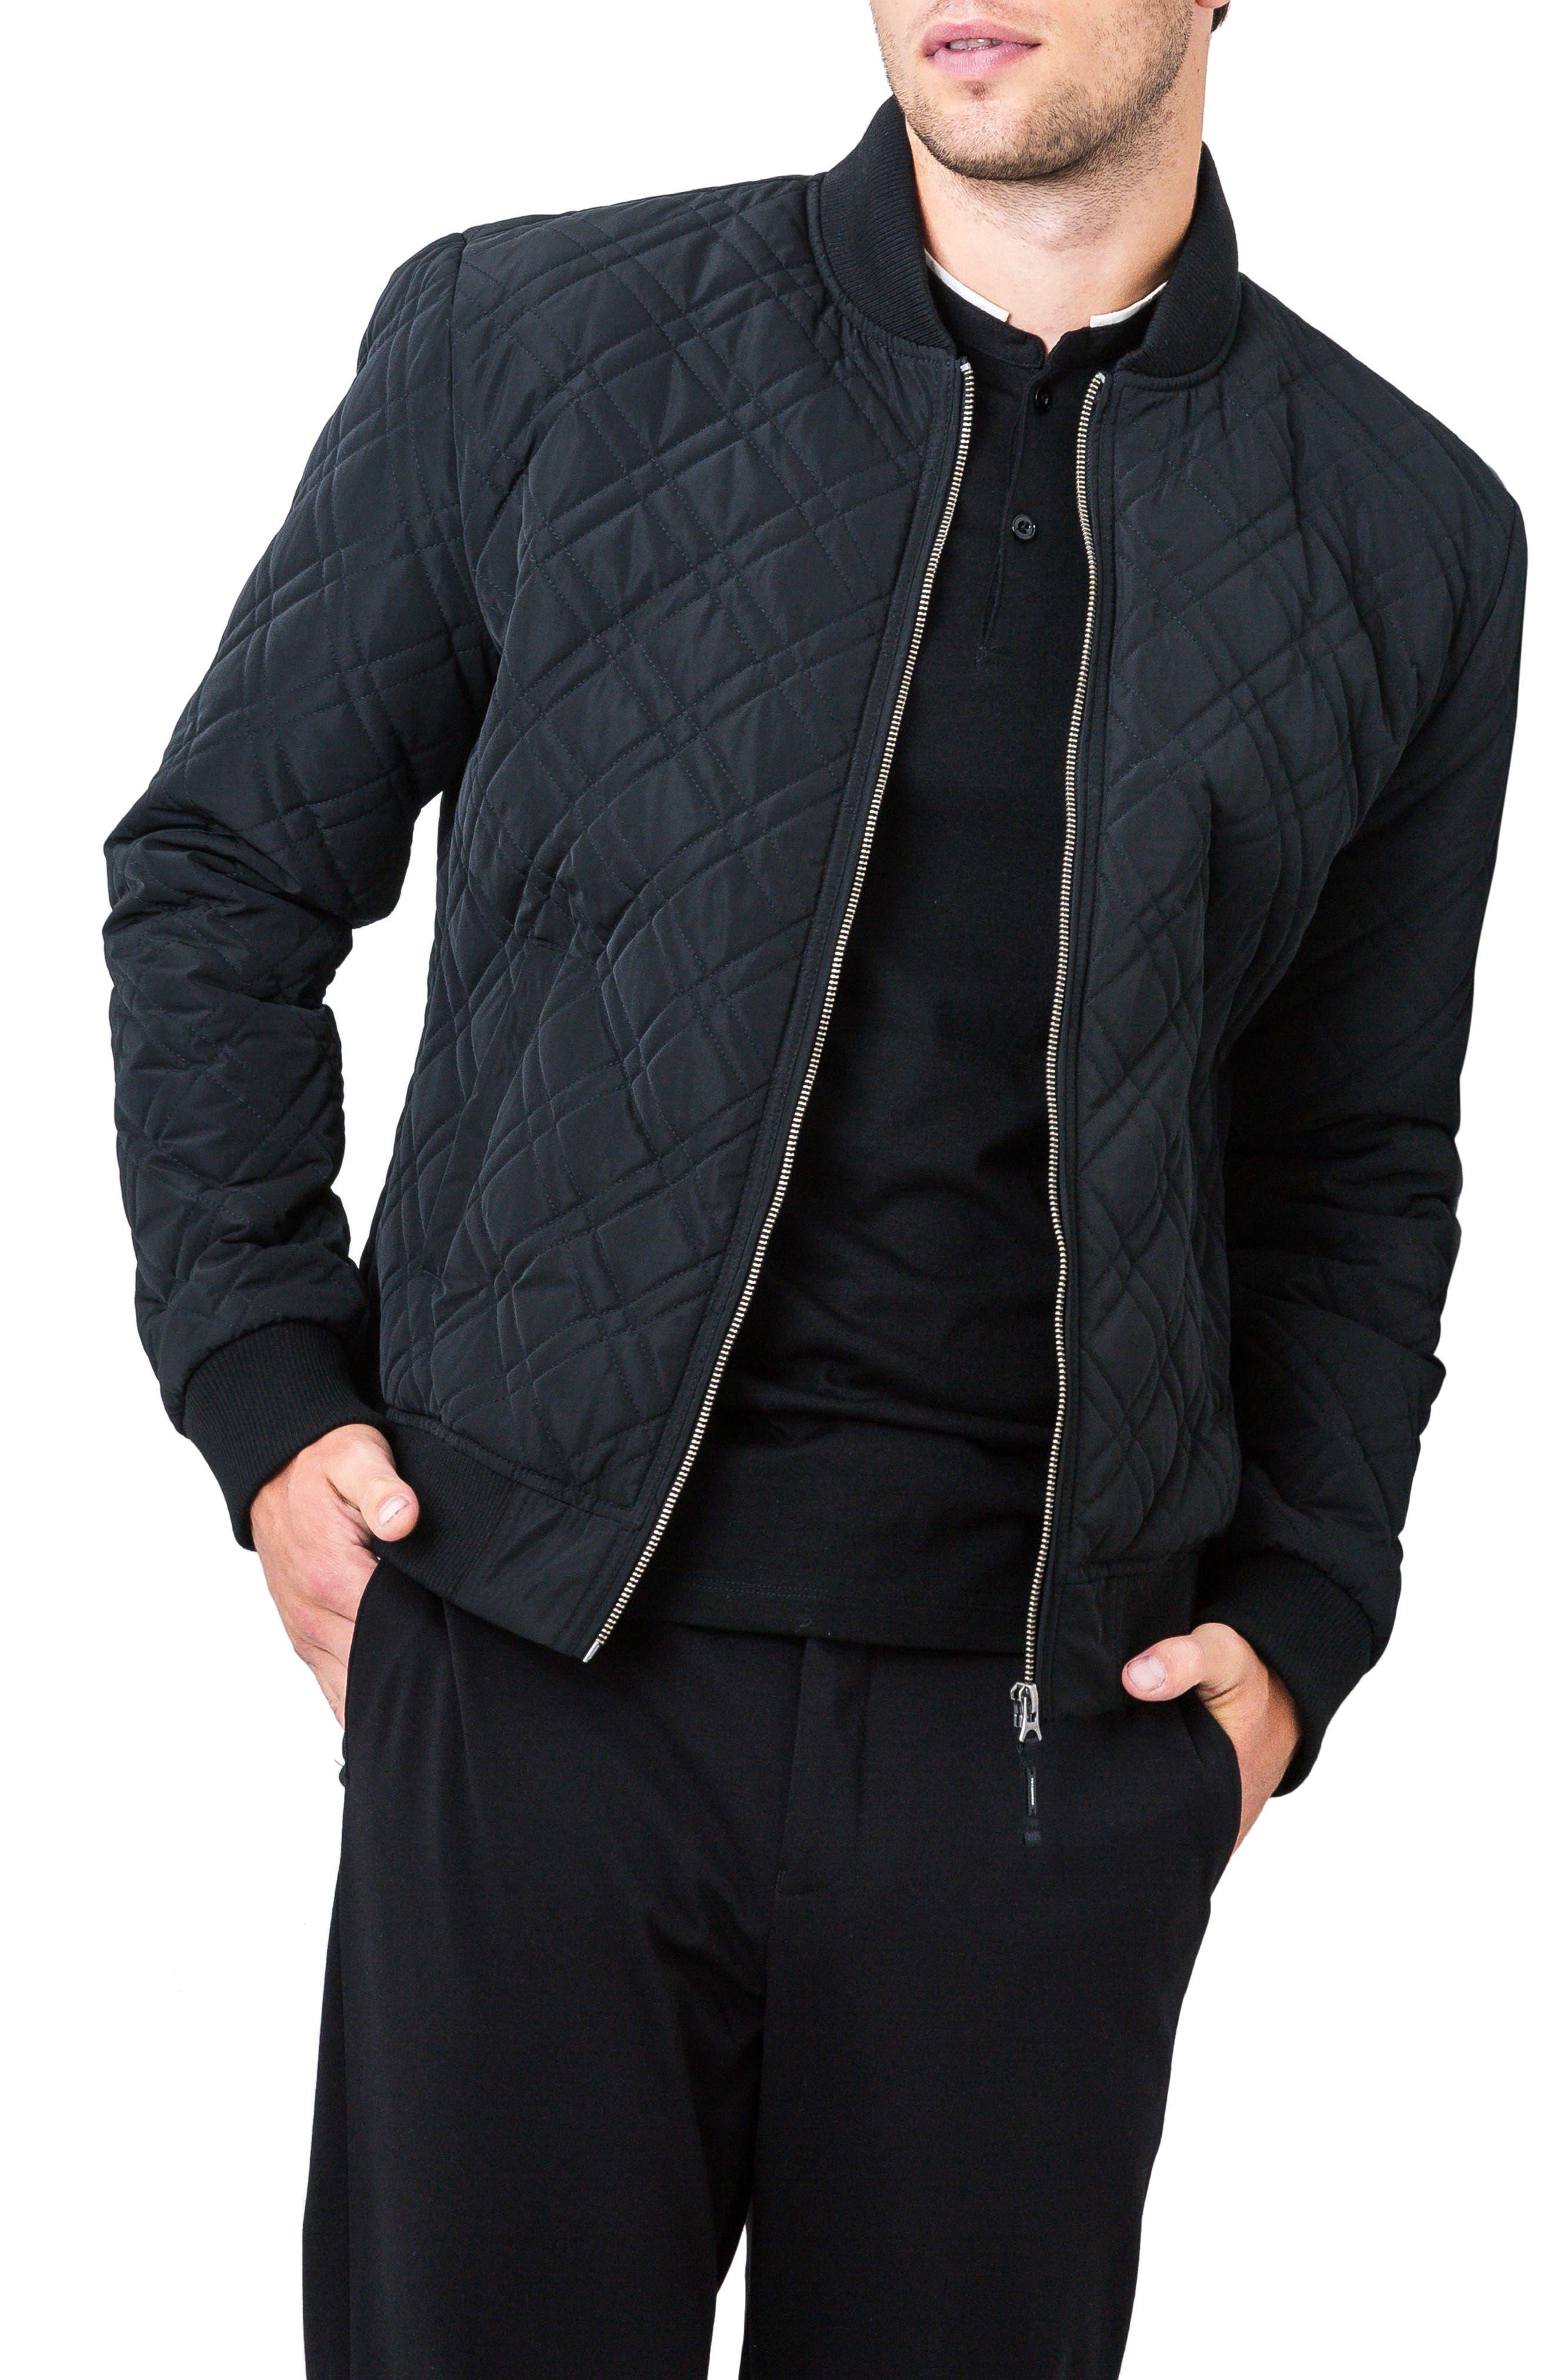 Arca Quilt Jacket,                             Main thumbnail 1, color,                             001